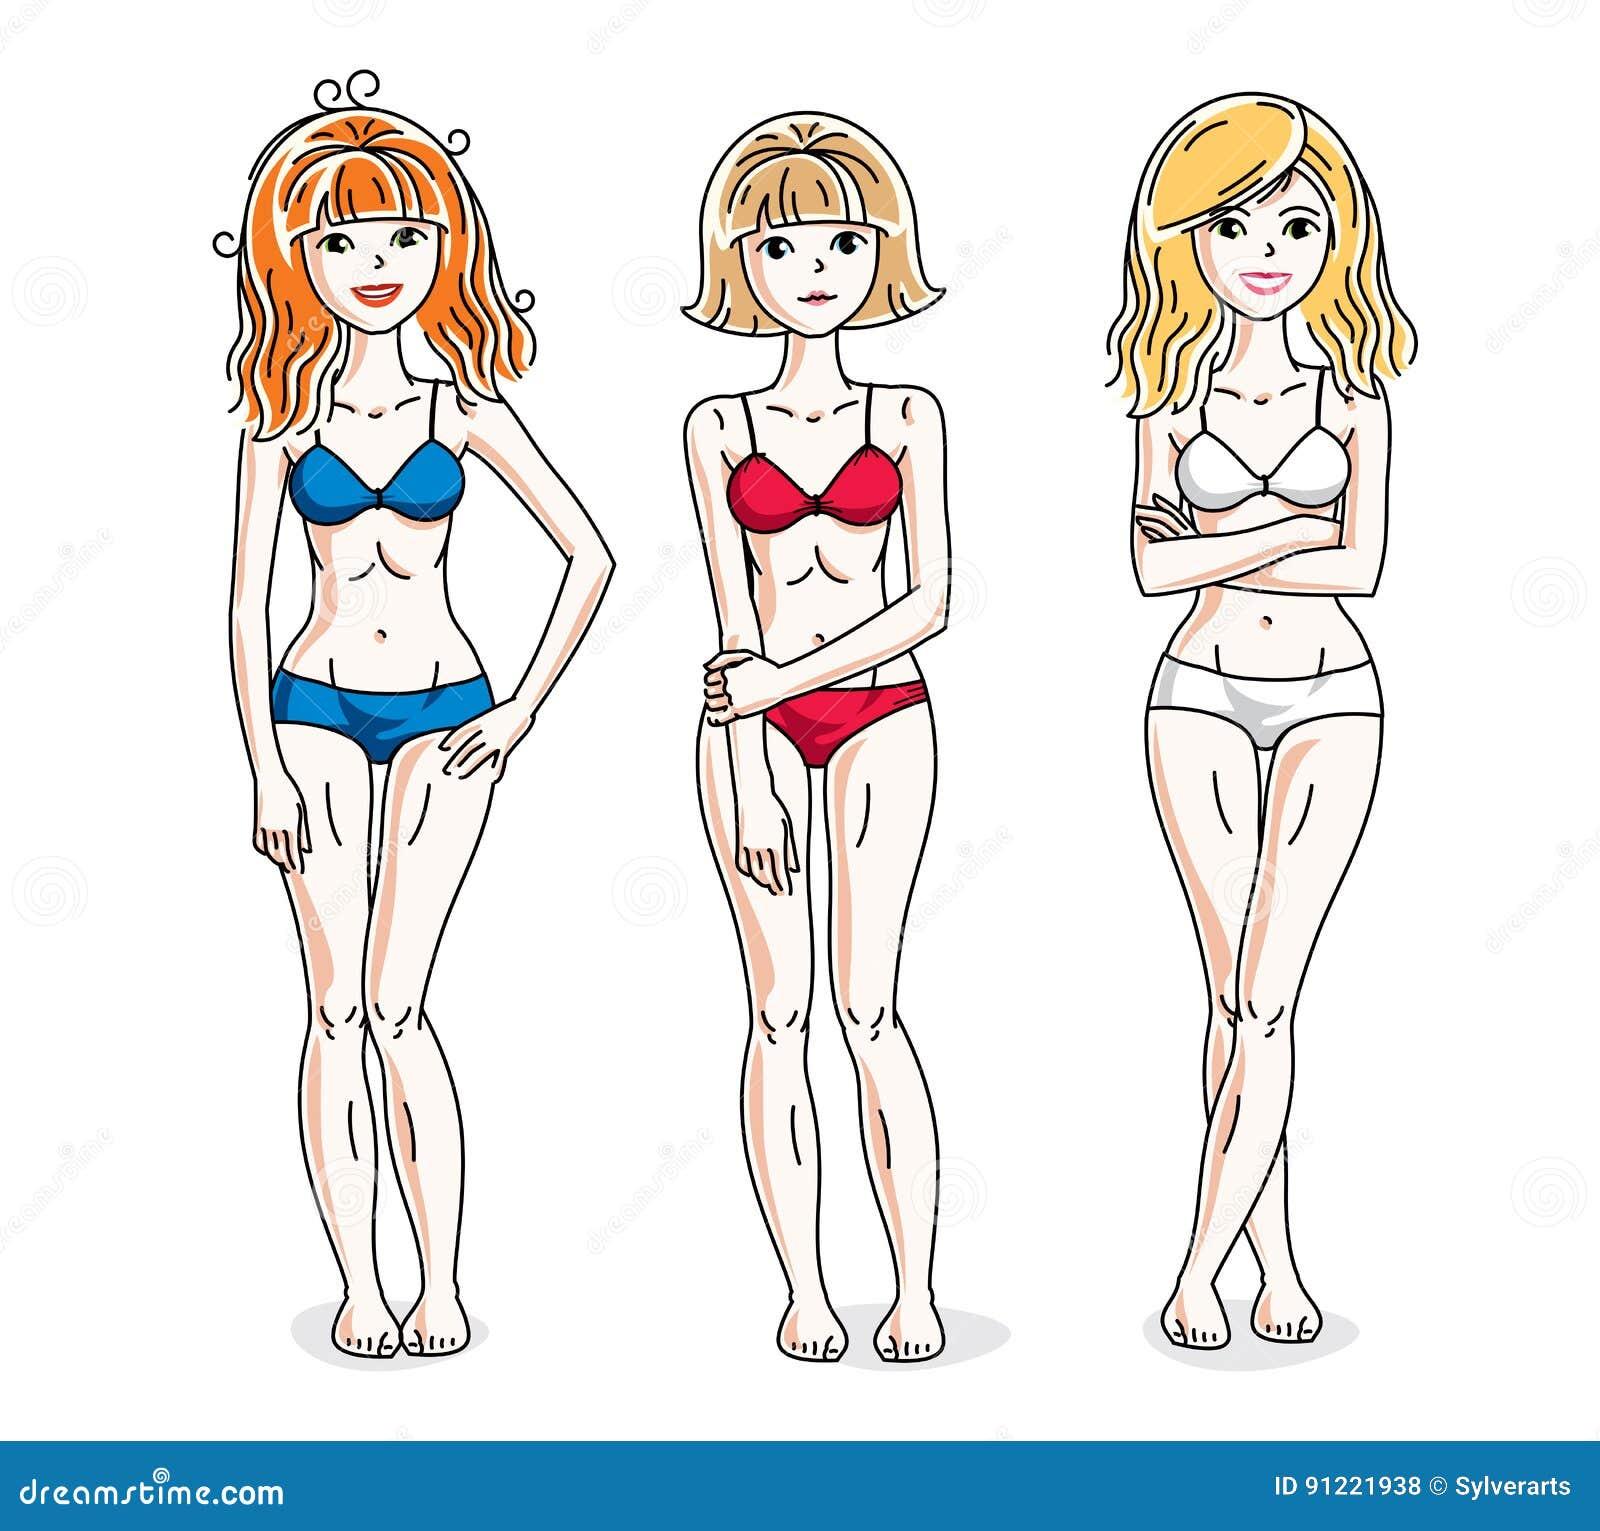 921e7bf2a5 Young beautiful women standing wearing colorful bikini. Vector diversity  people illustrations set.